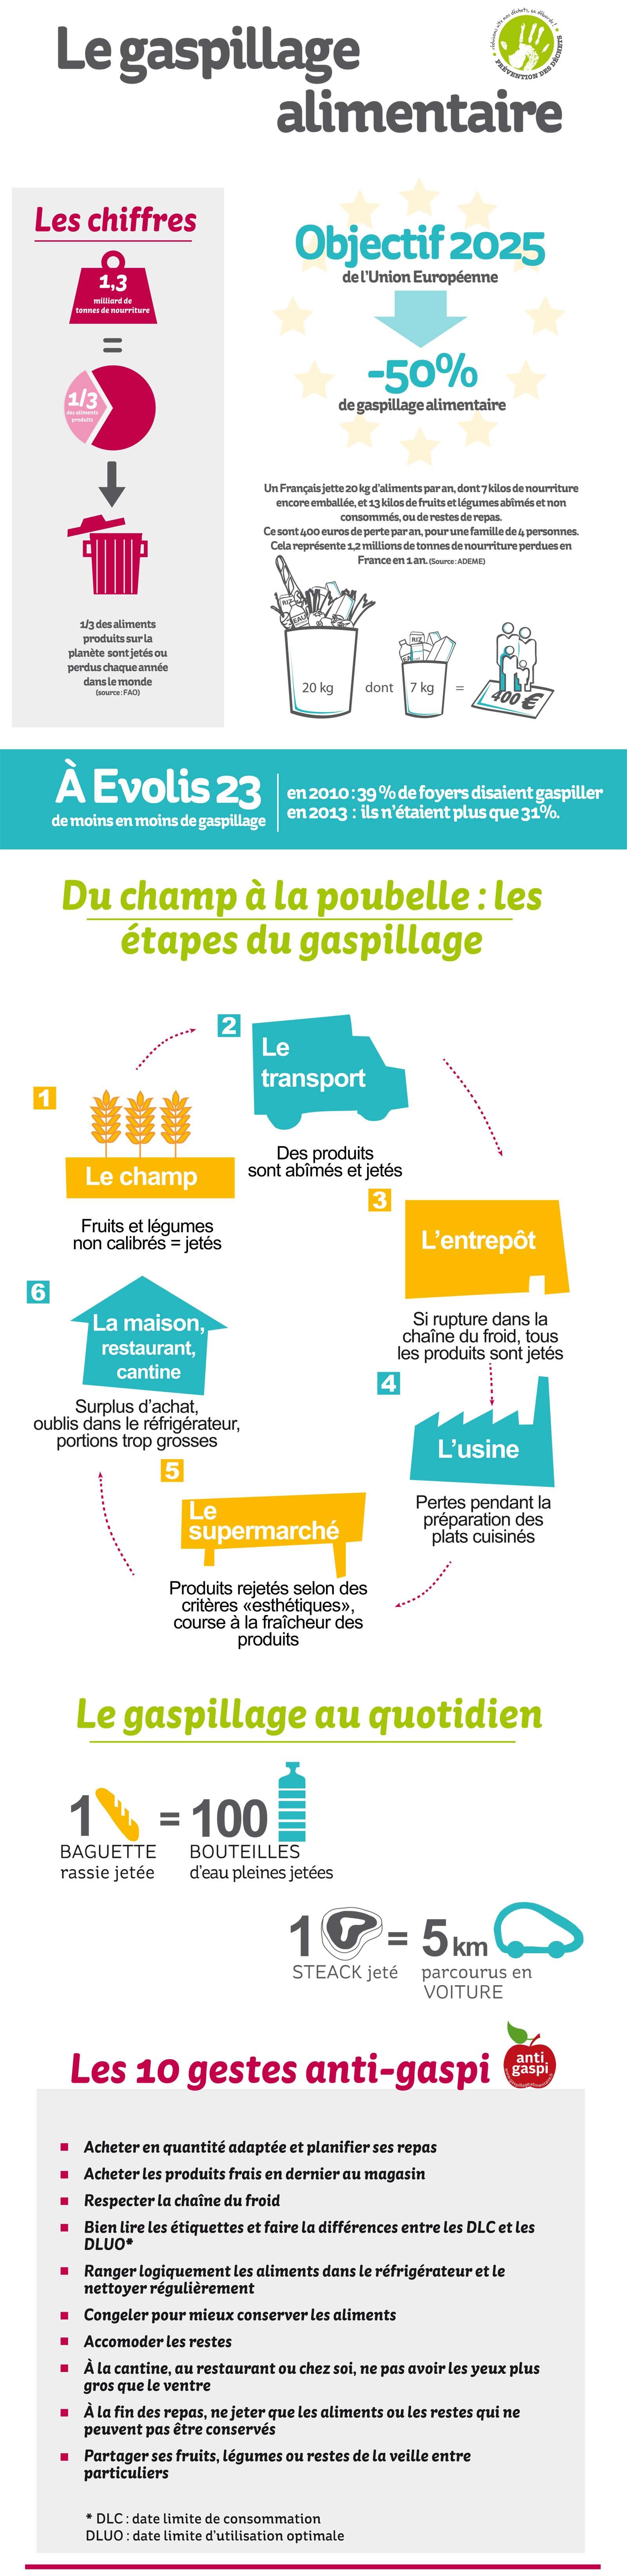 Infographie lutte contre le gaspillage alimentaire